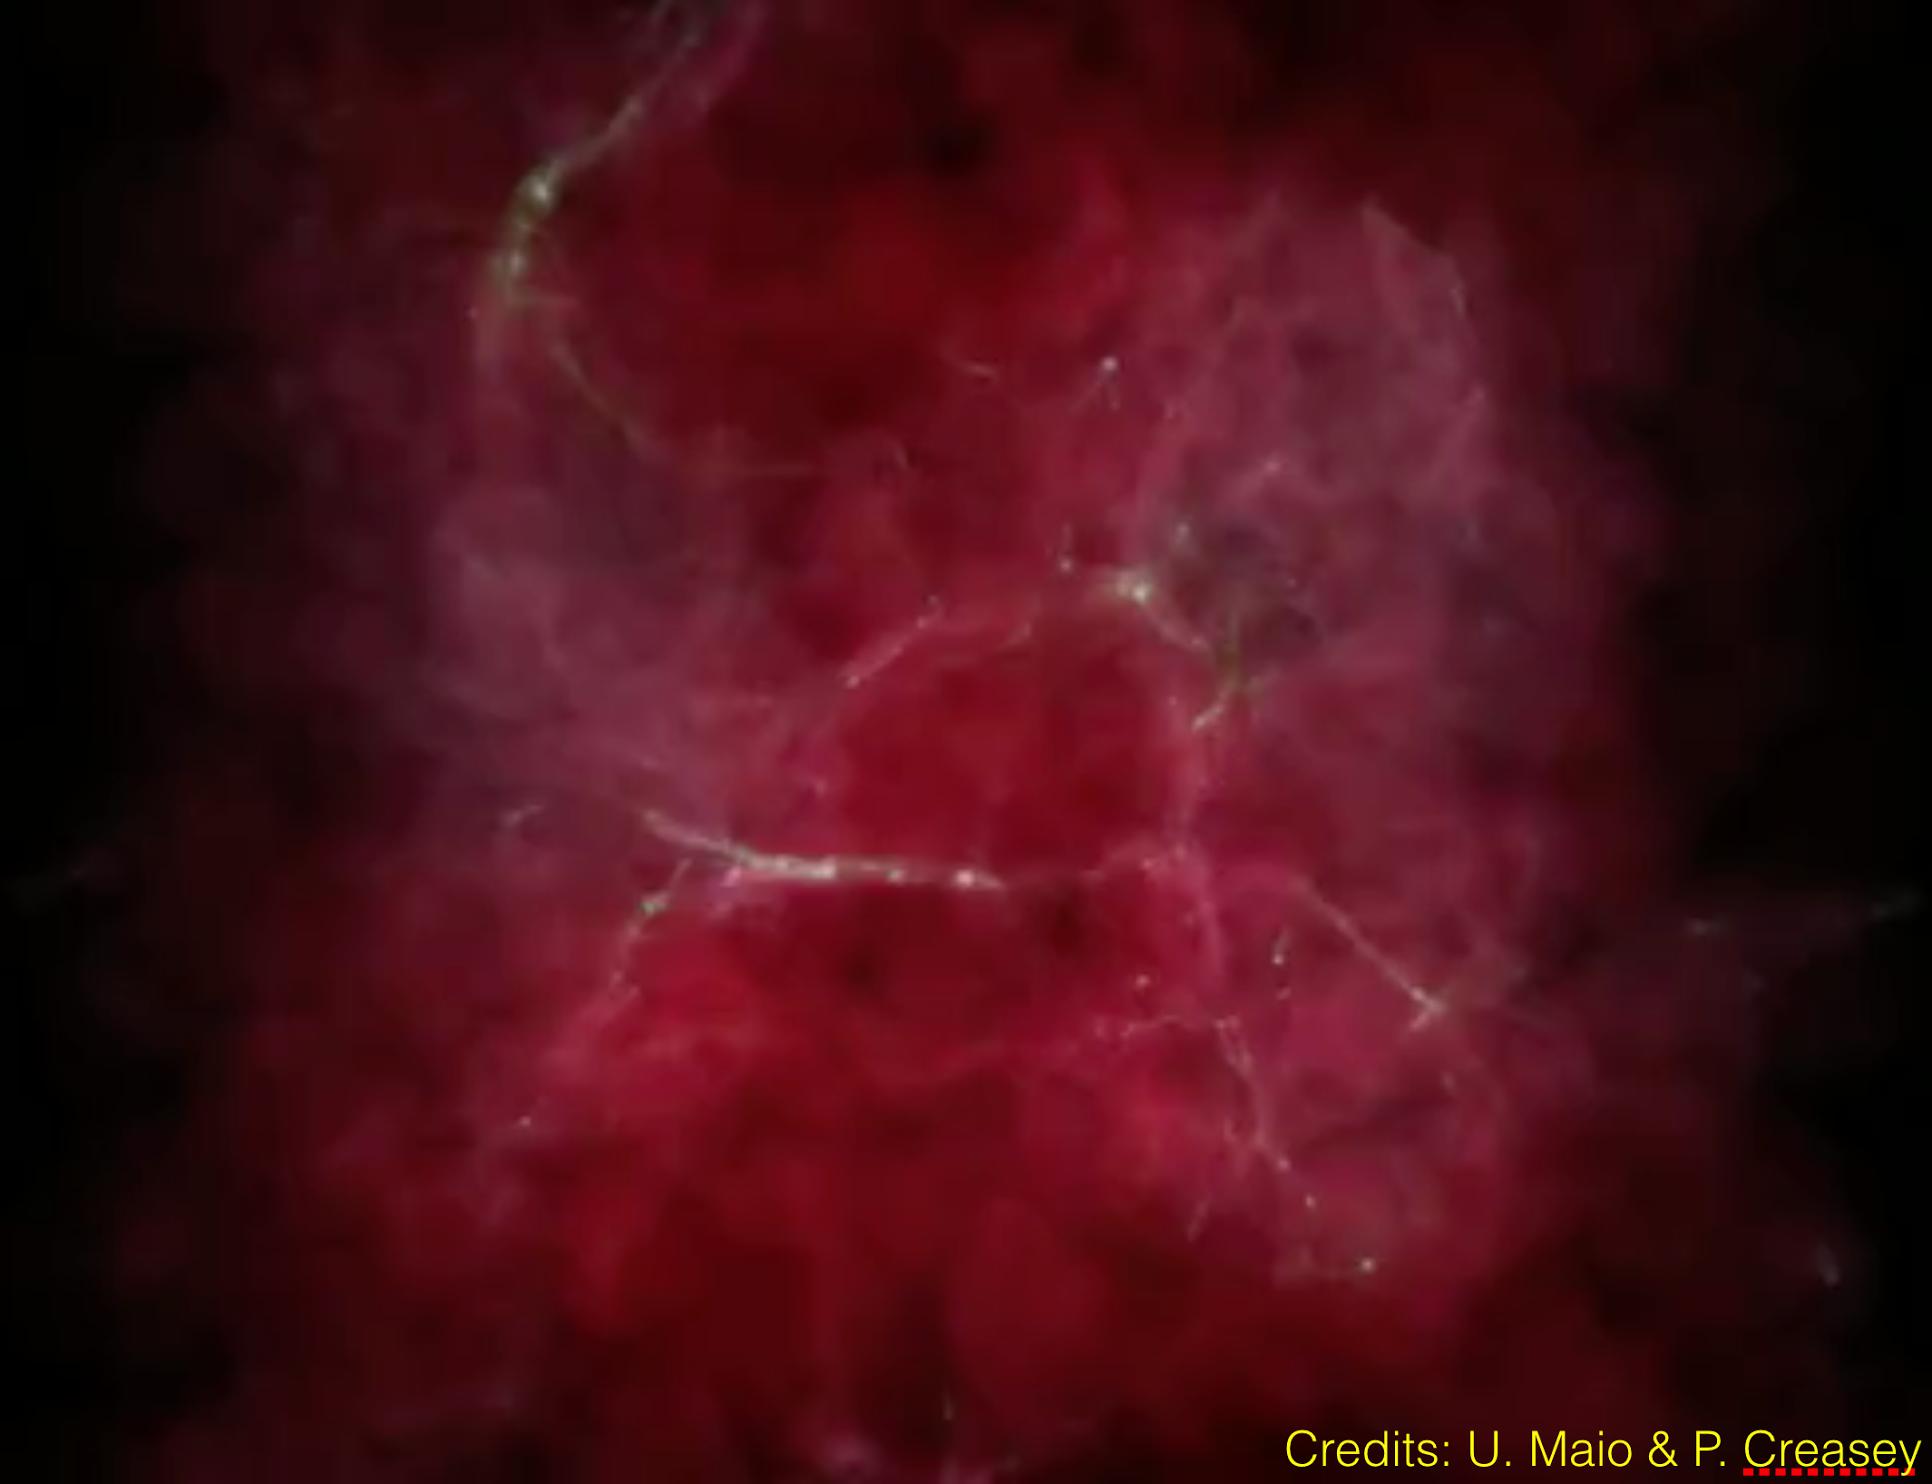 Sonnenfinsternis in einhundert Spektren